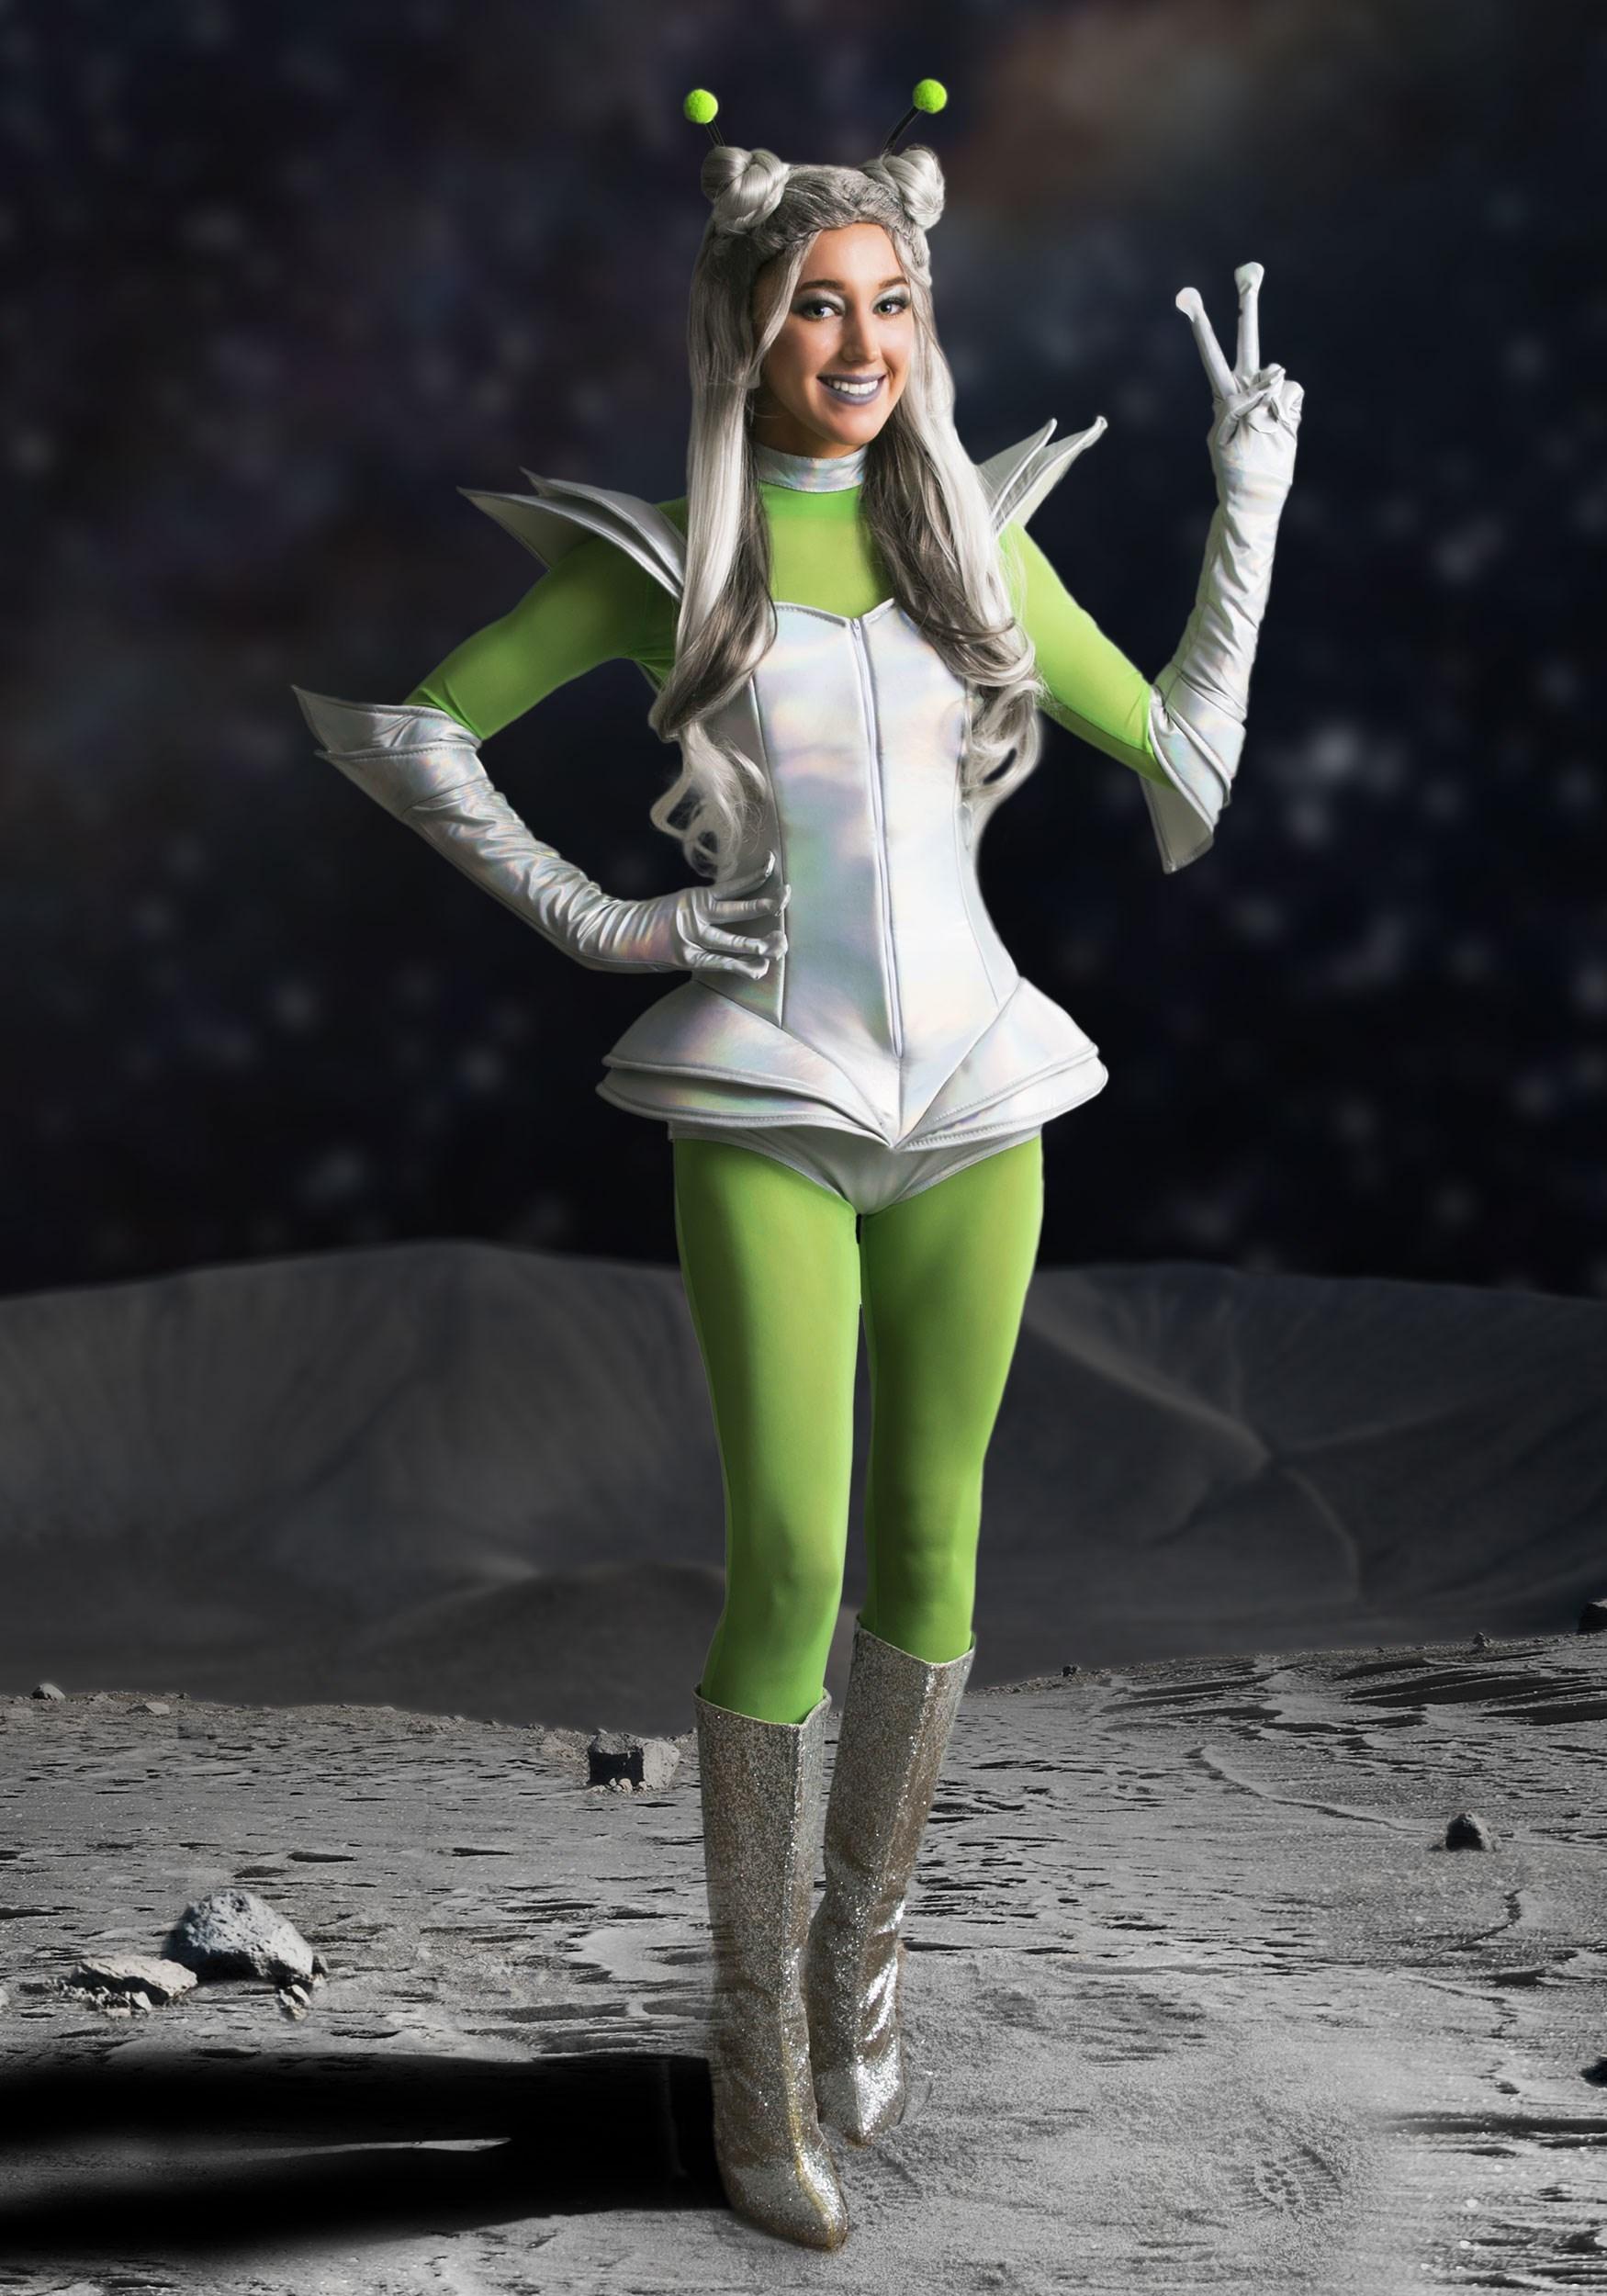 Galactic Alien Babe Costume for Women